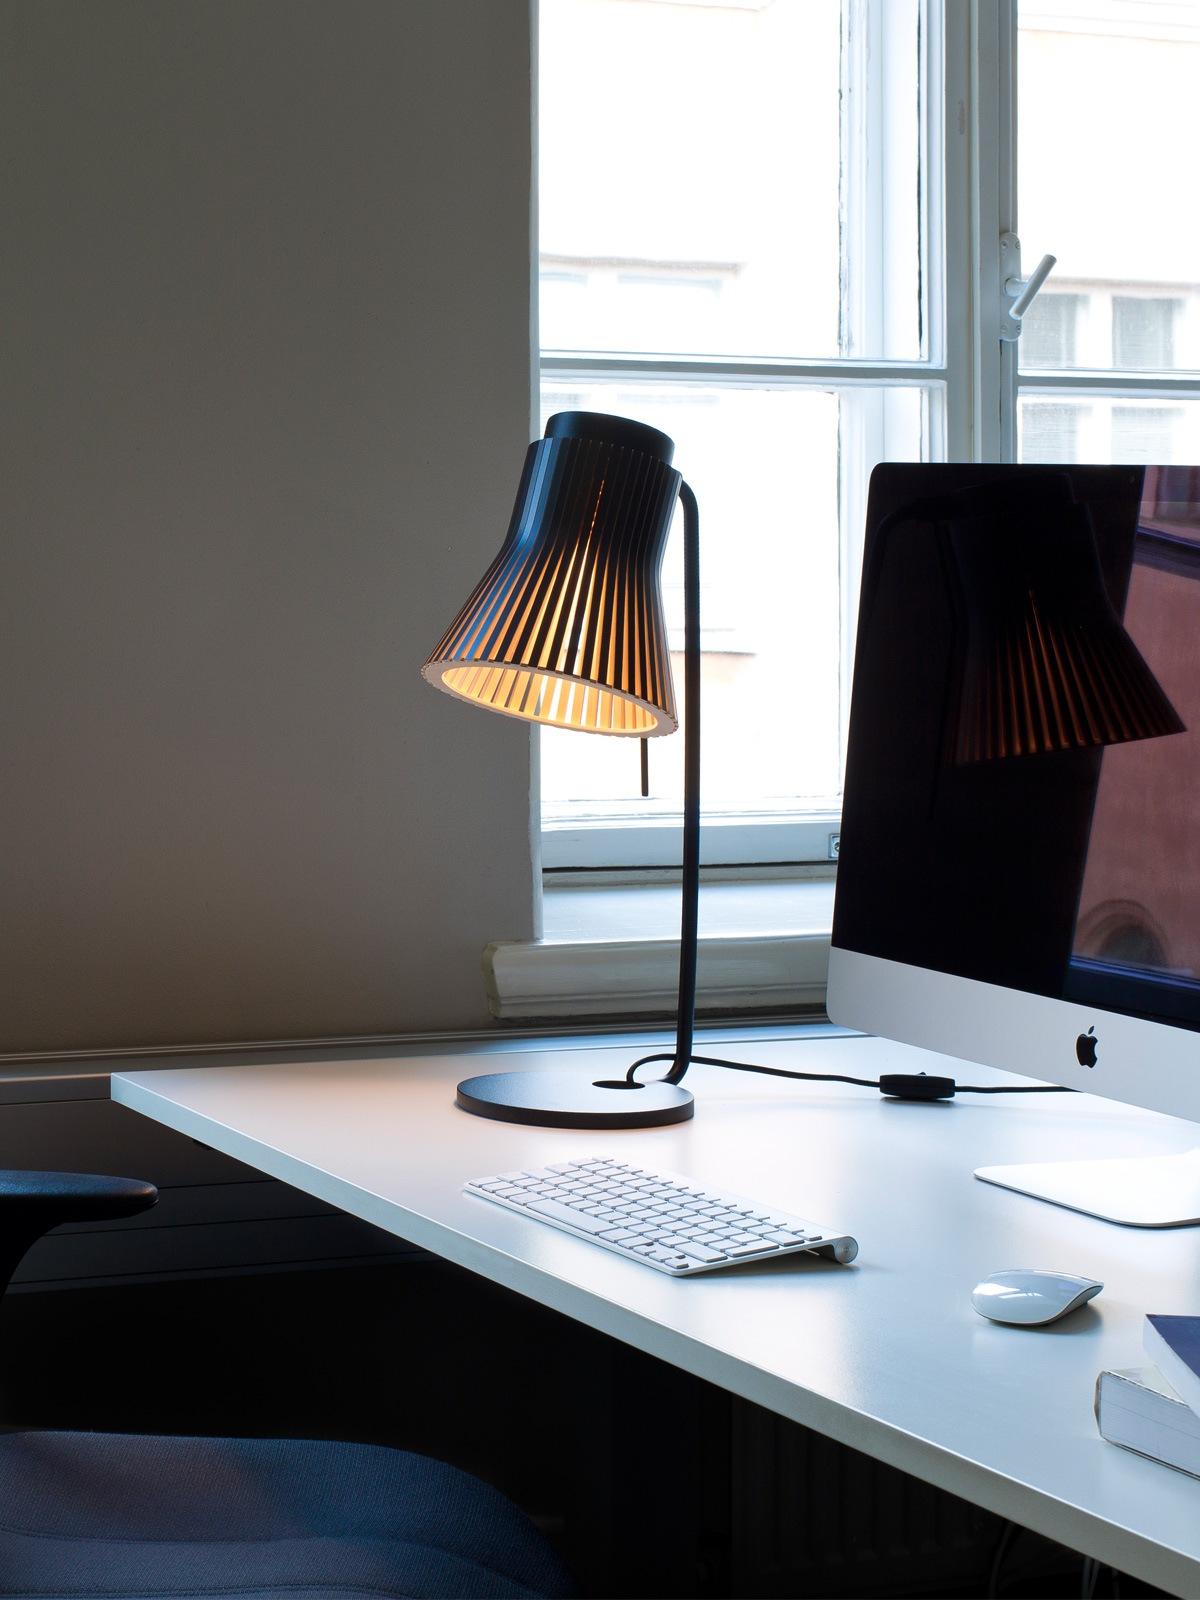 Secto Petite 4620 Tischleuchte Secto Design DesignOrt Berlin Lampen Onlineshop